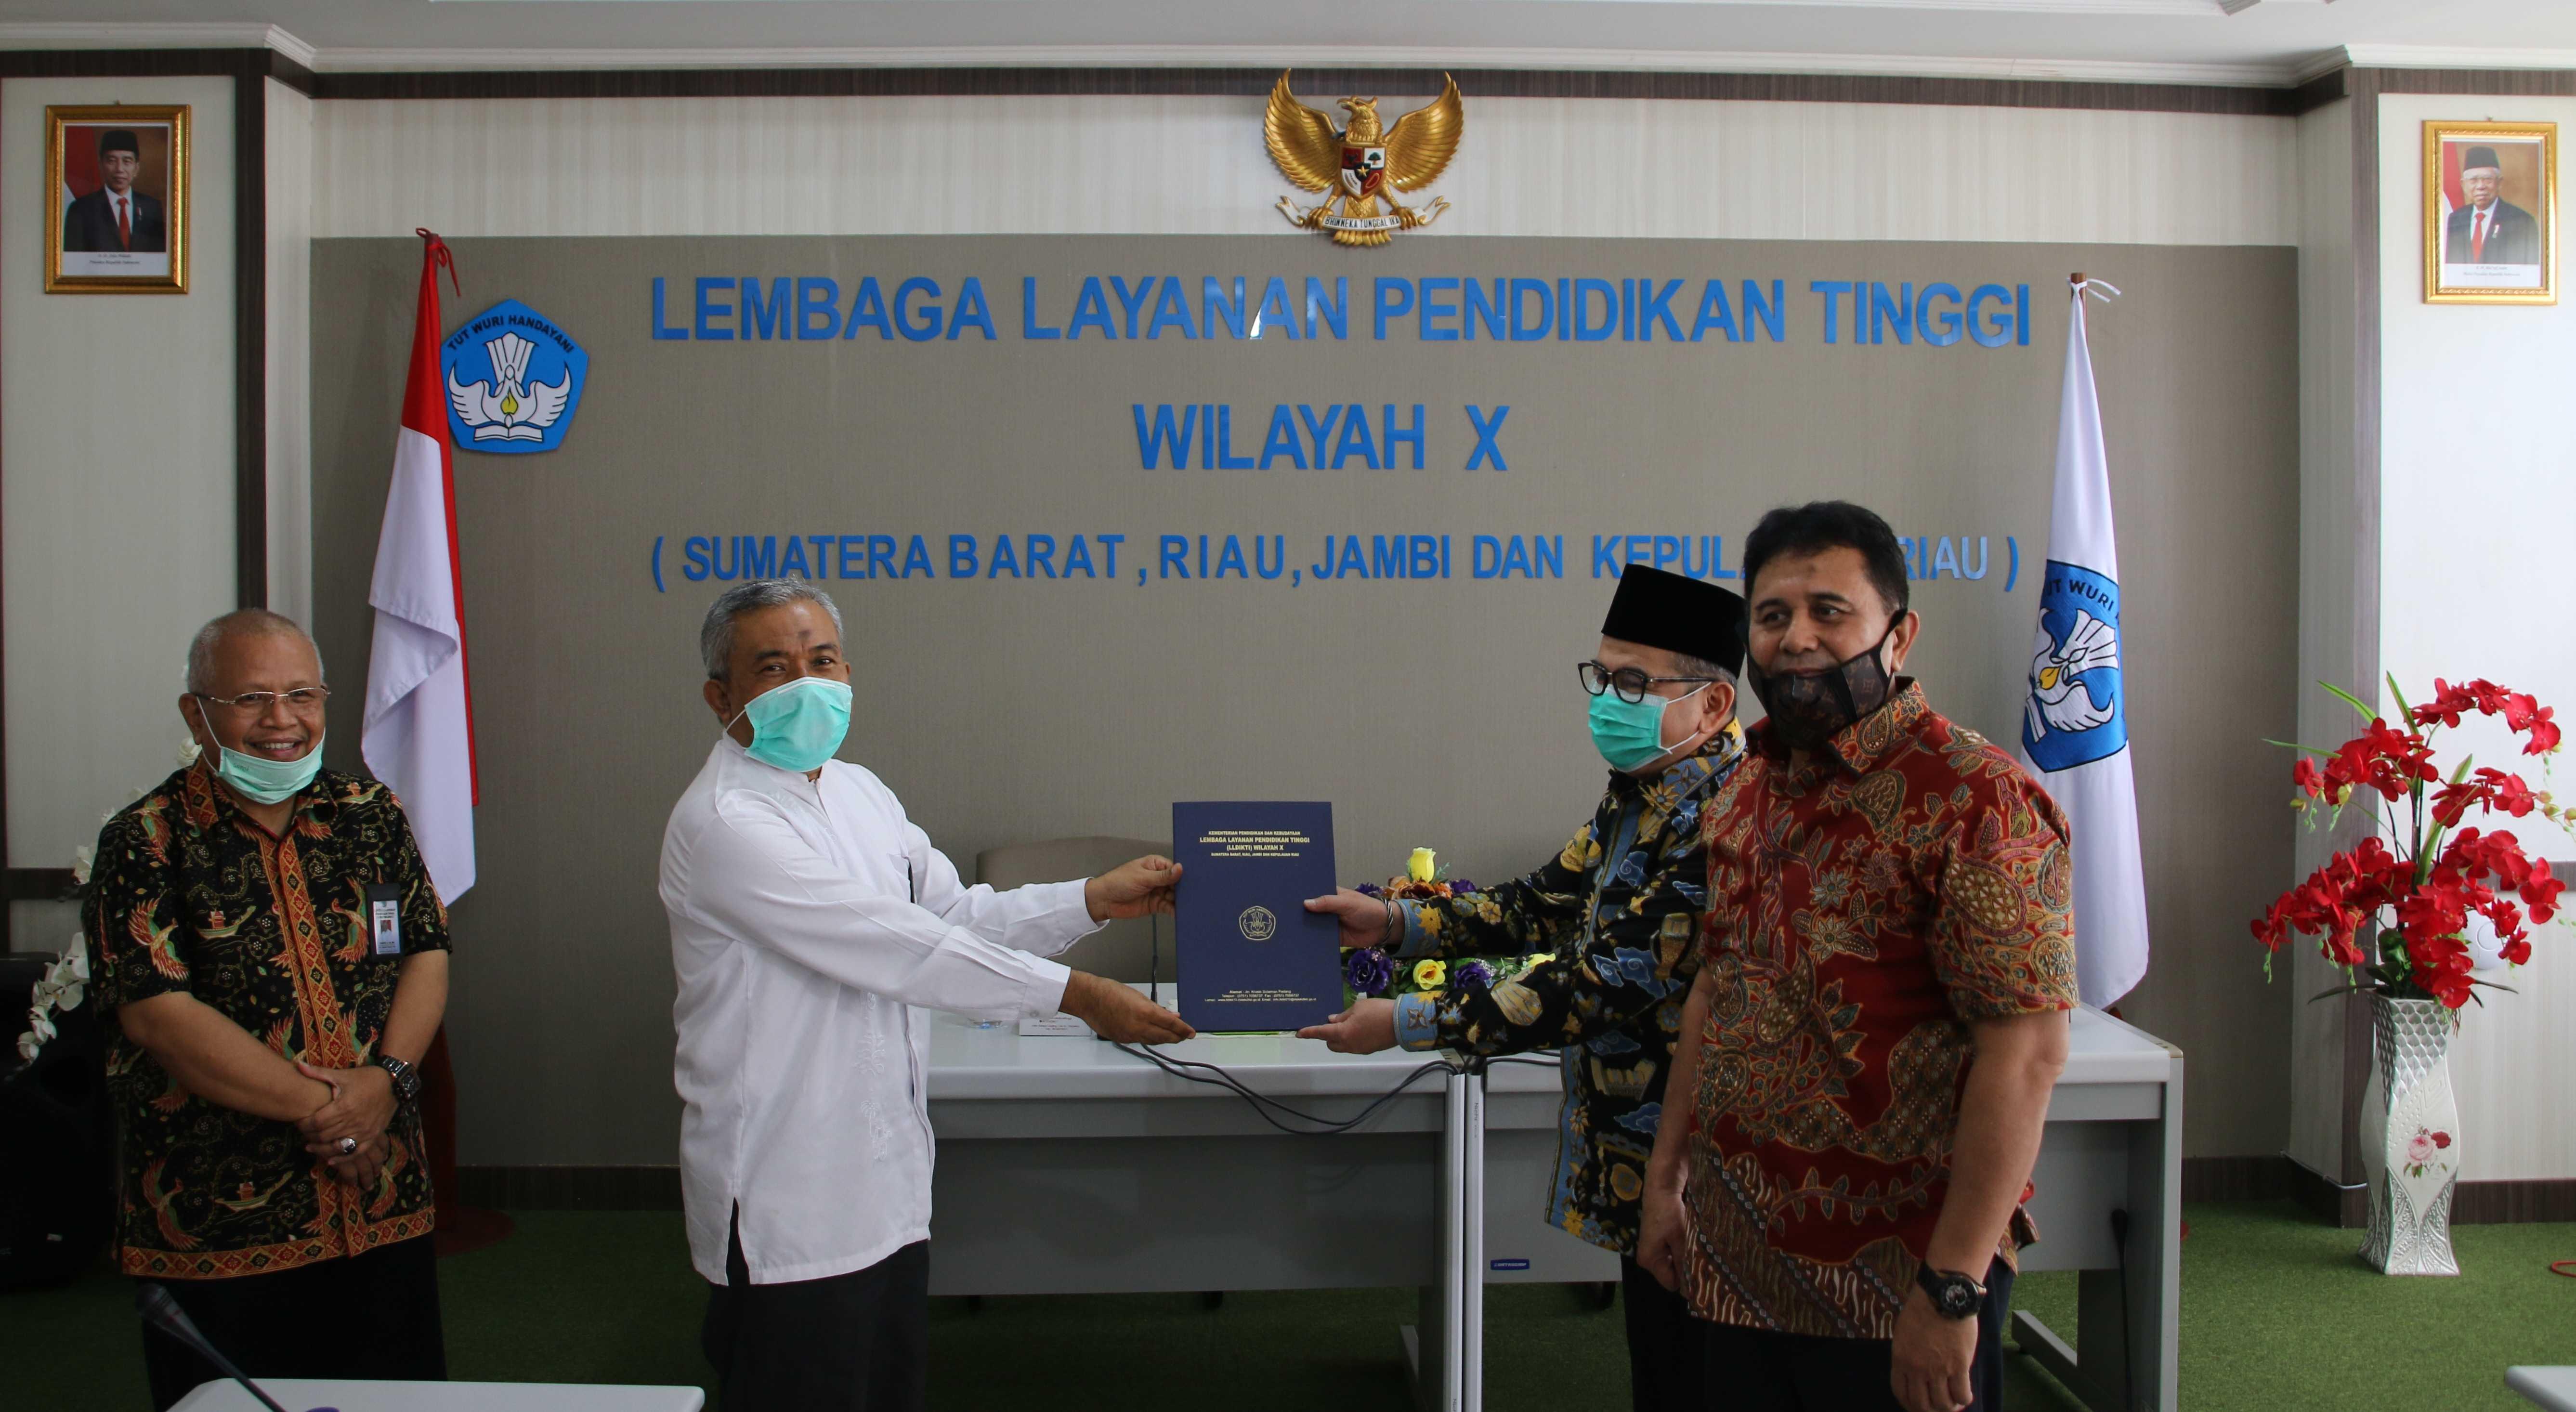 Kepala_LLDIKTI_Wilayah_X_Serahkan_SK_Universitas_Perintis_Indoenesia.JPG